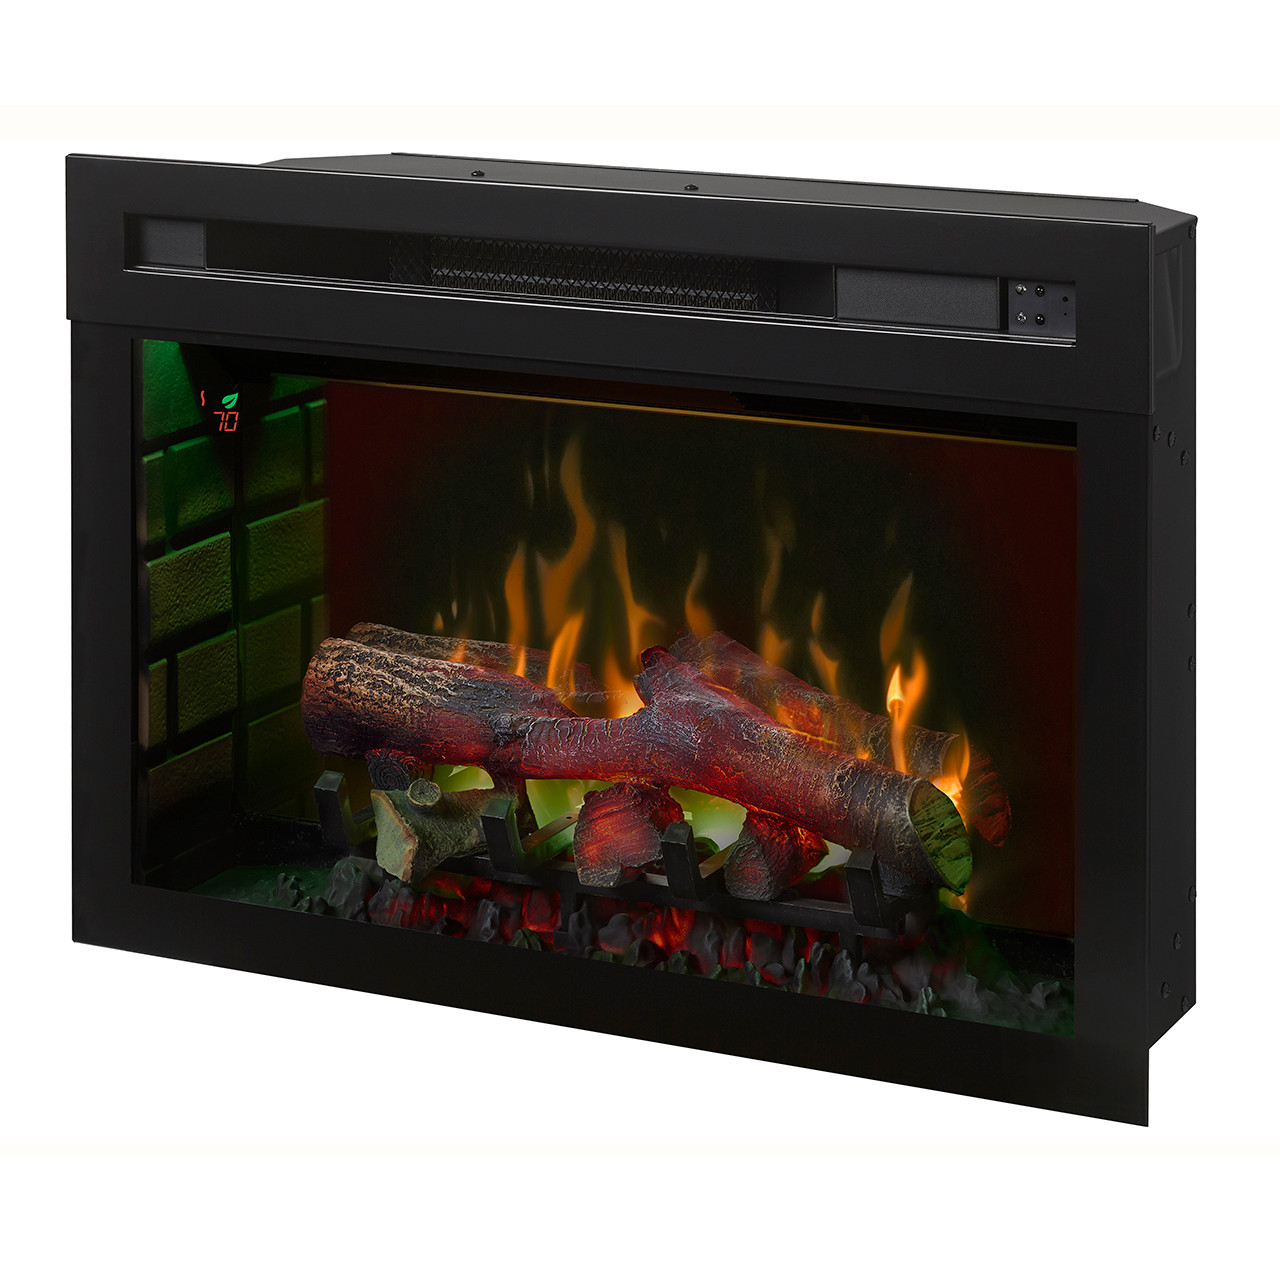 "Dimplex 25"" Multi-Fire XD Electric Firebox w/ Logs - Green"